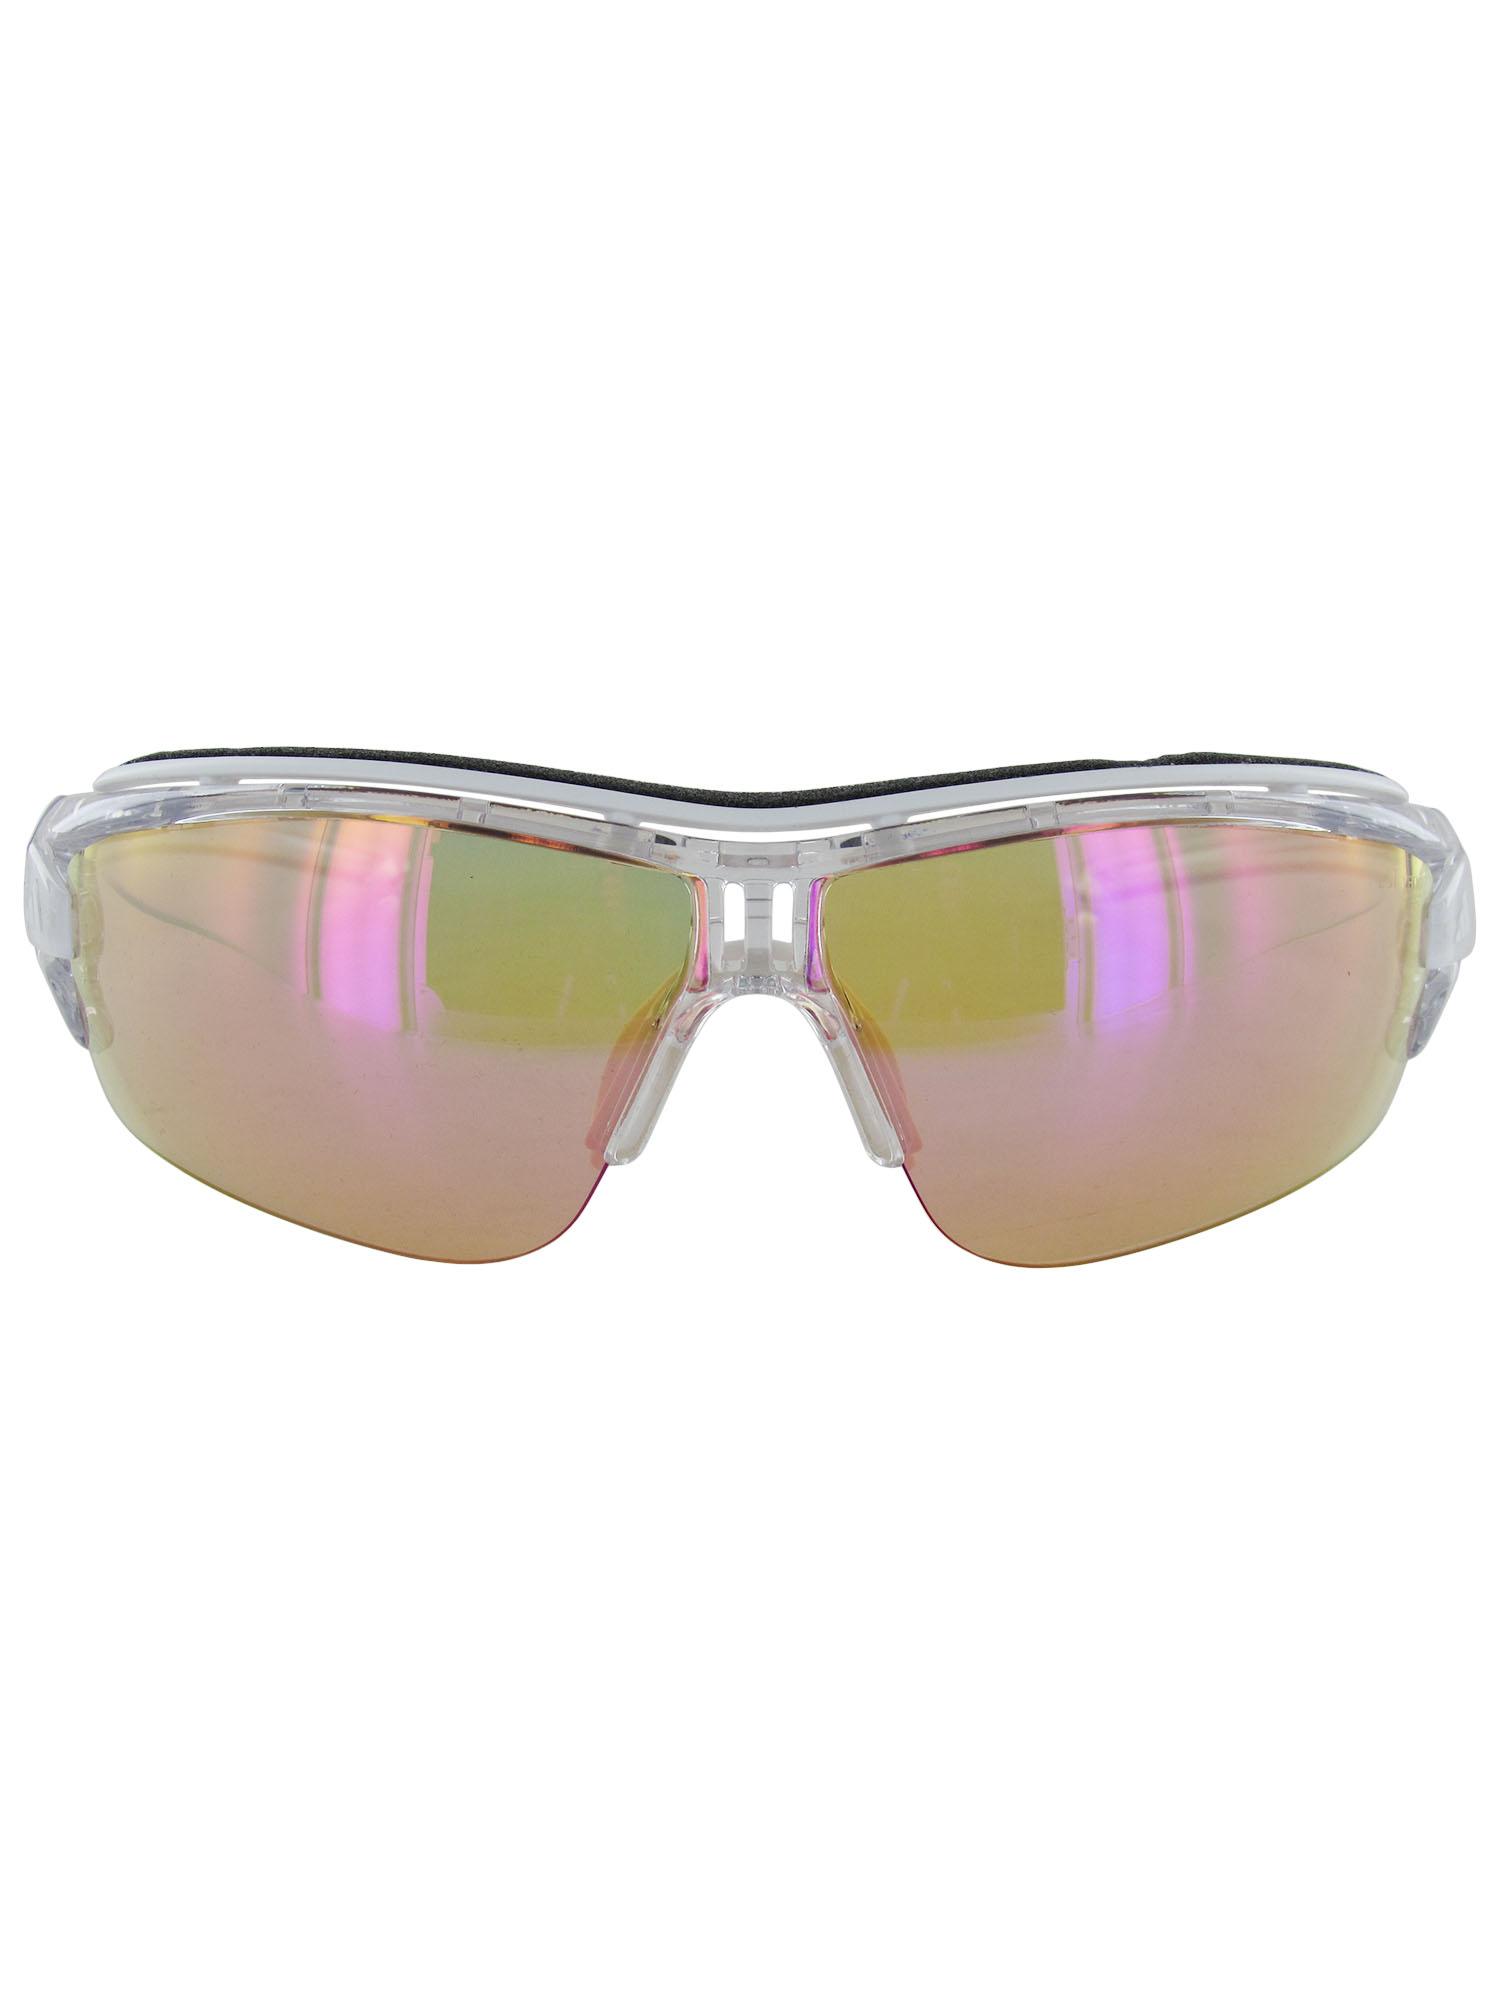 Adidas-Evil-Eye-Halfrim-Pro-XS-Sunglasses thumbnail 10